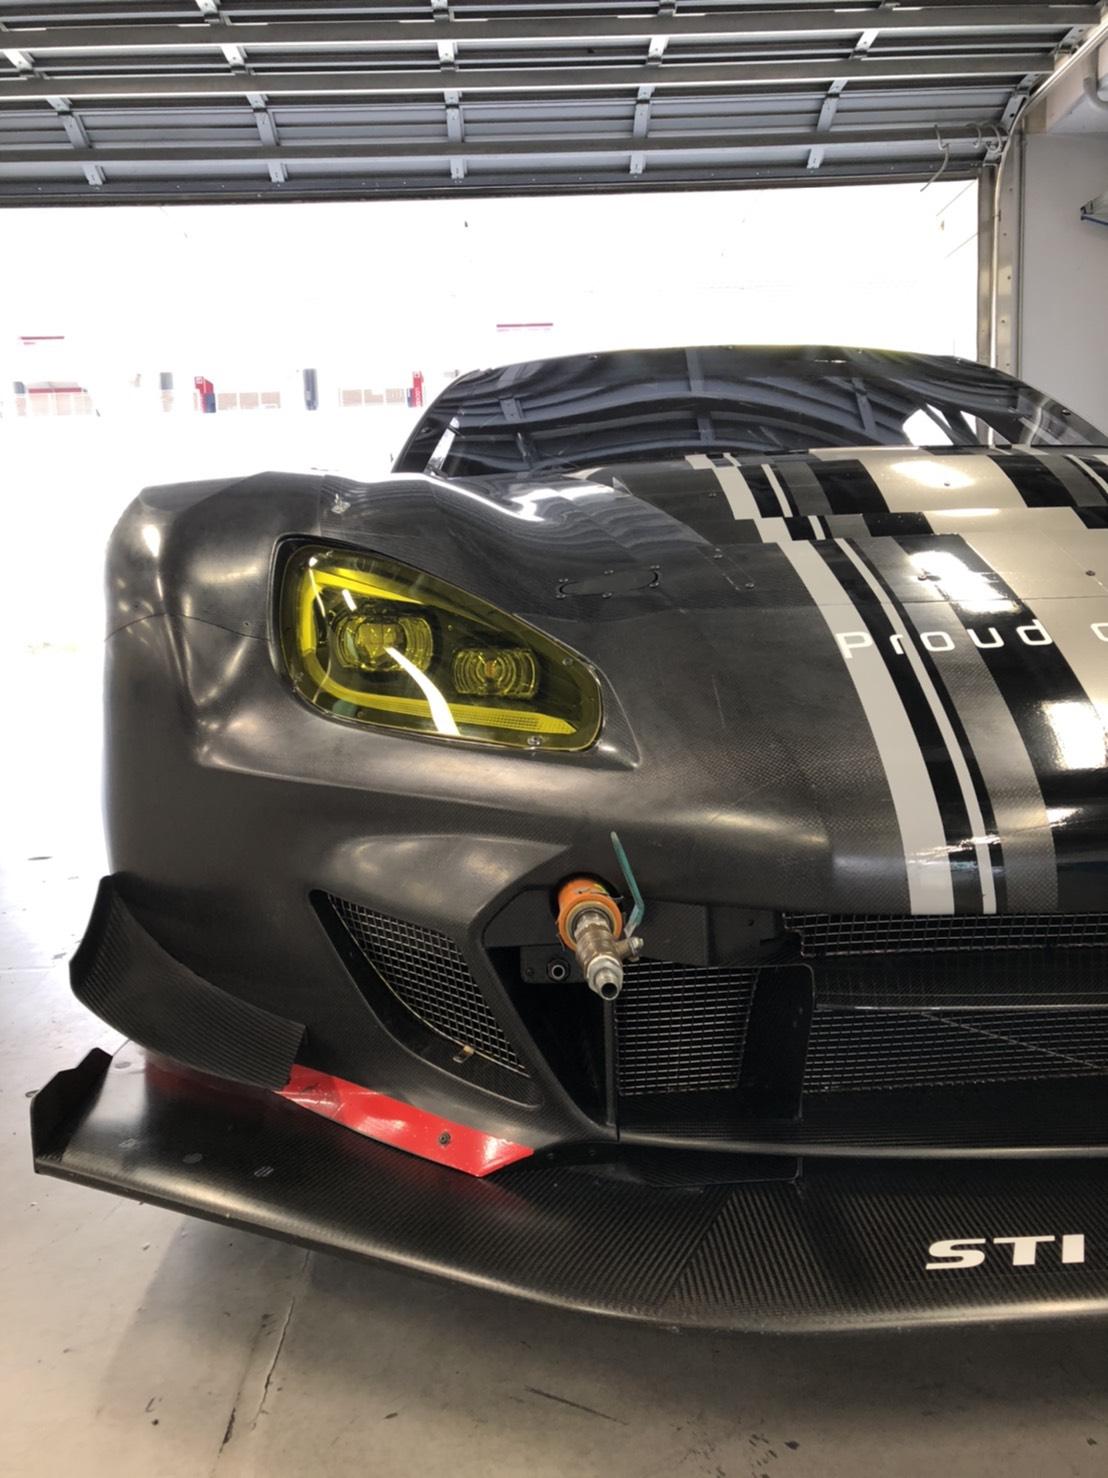 2021 Subaru BRZ GT300 front half